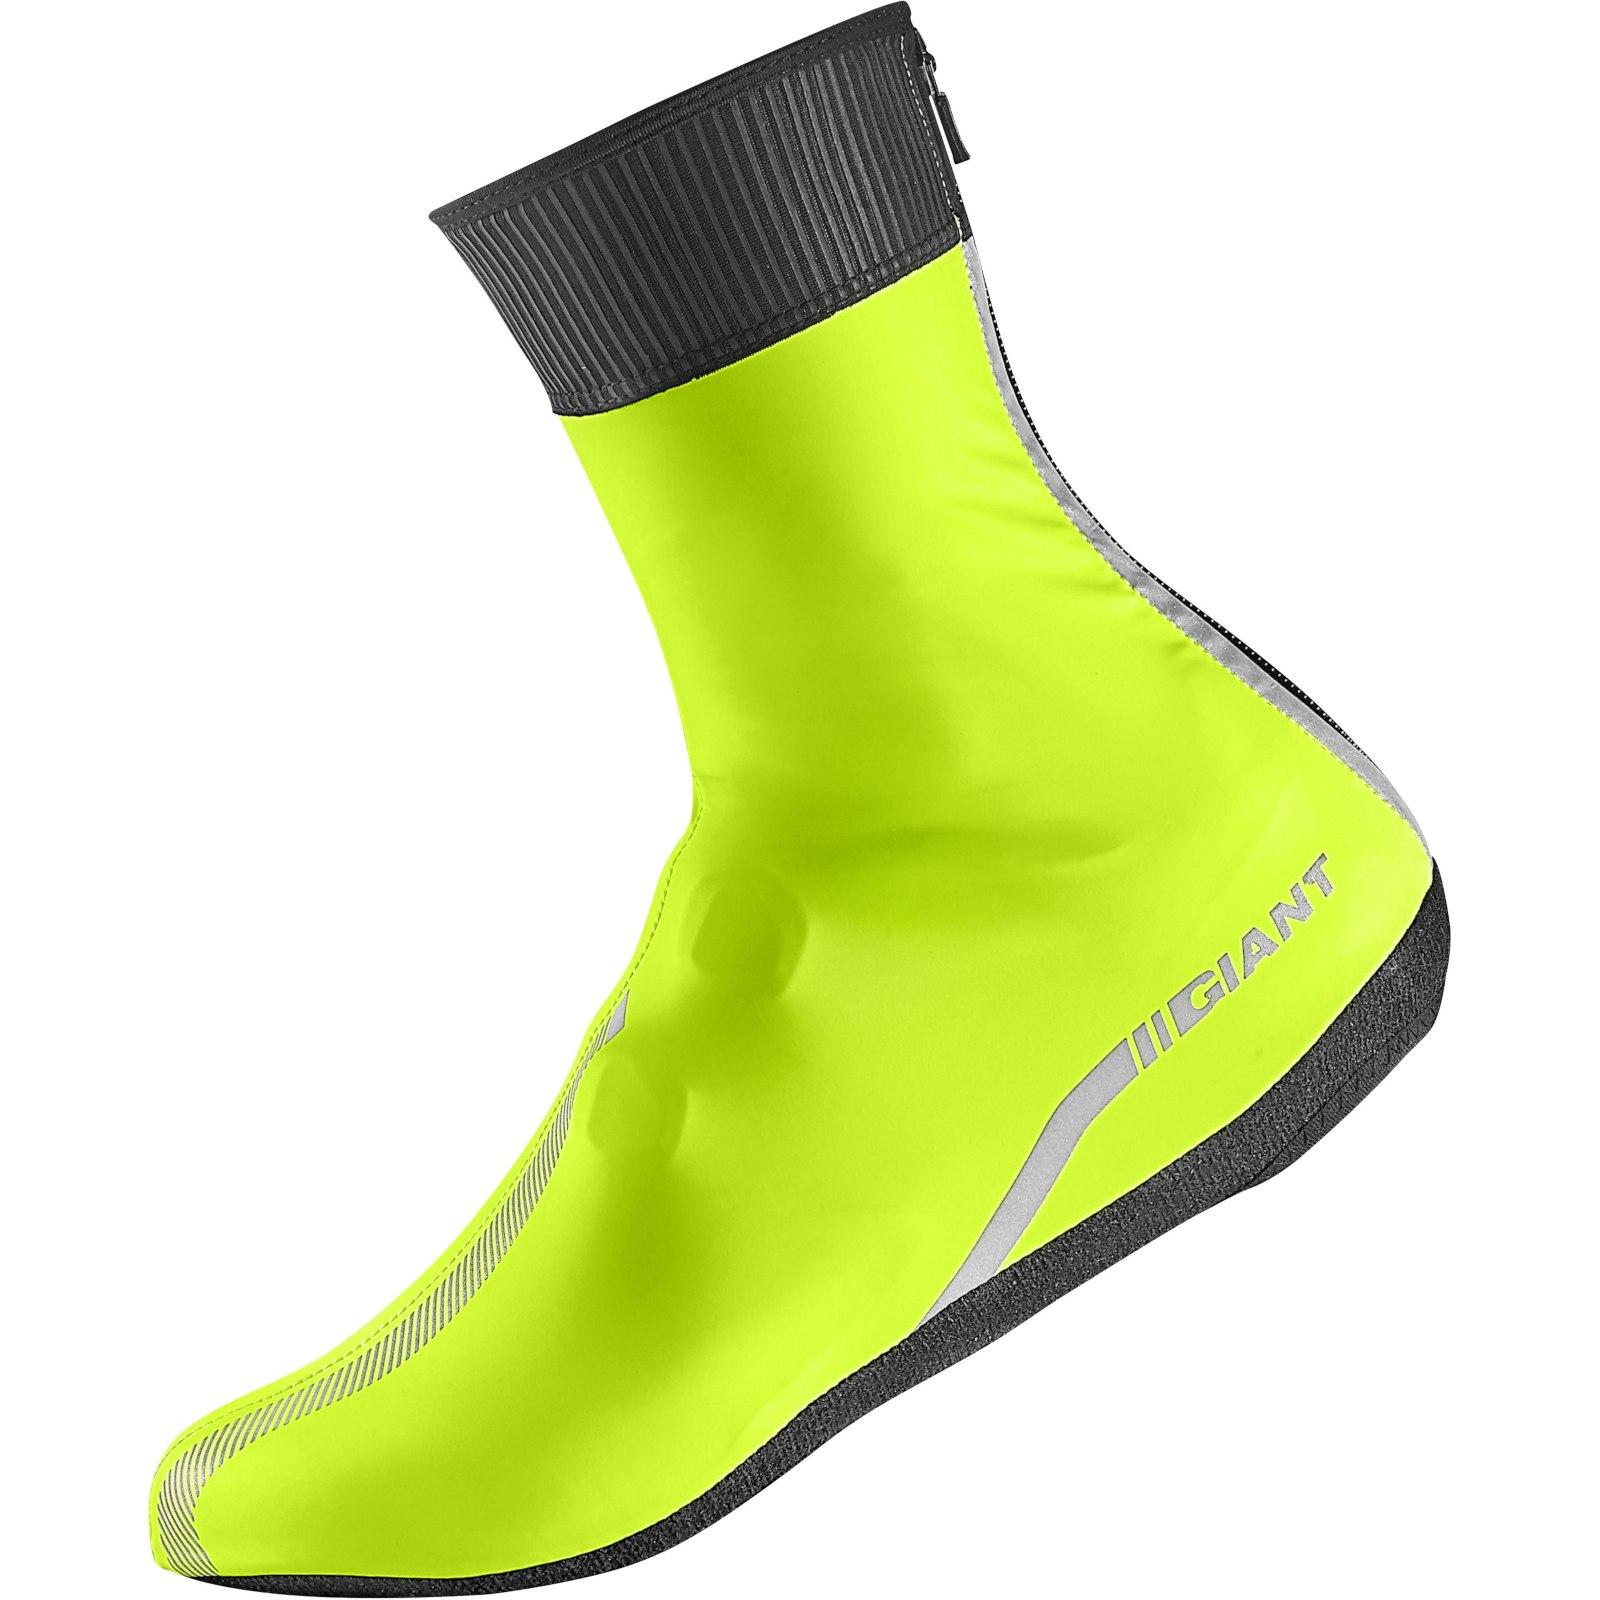 Giant Illume Shoe Cover - neon yellow